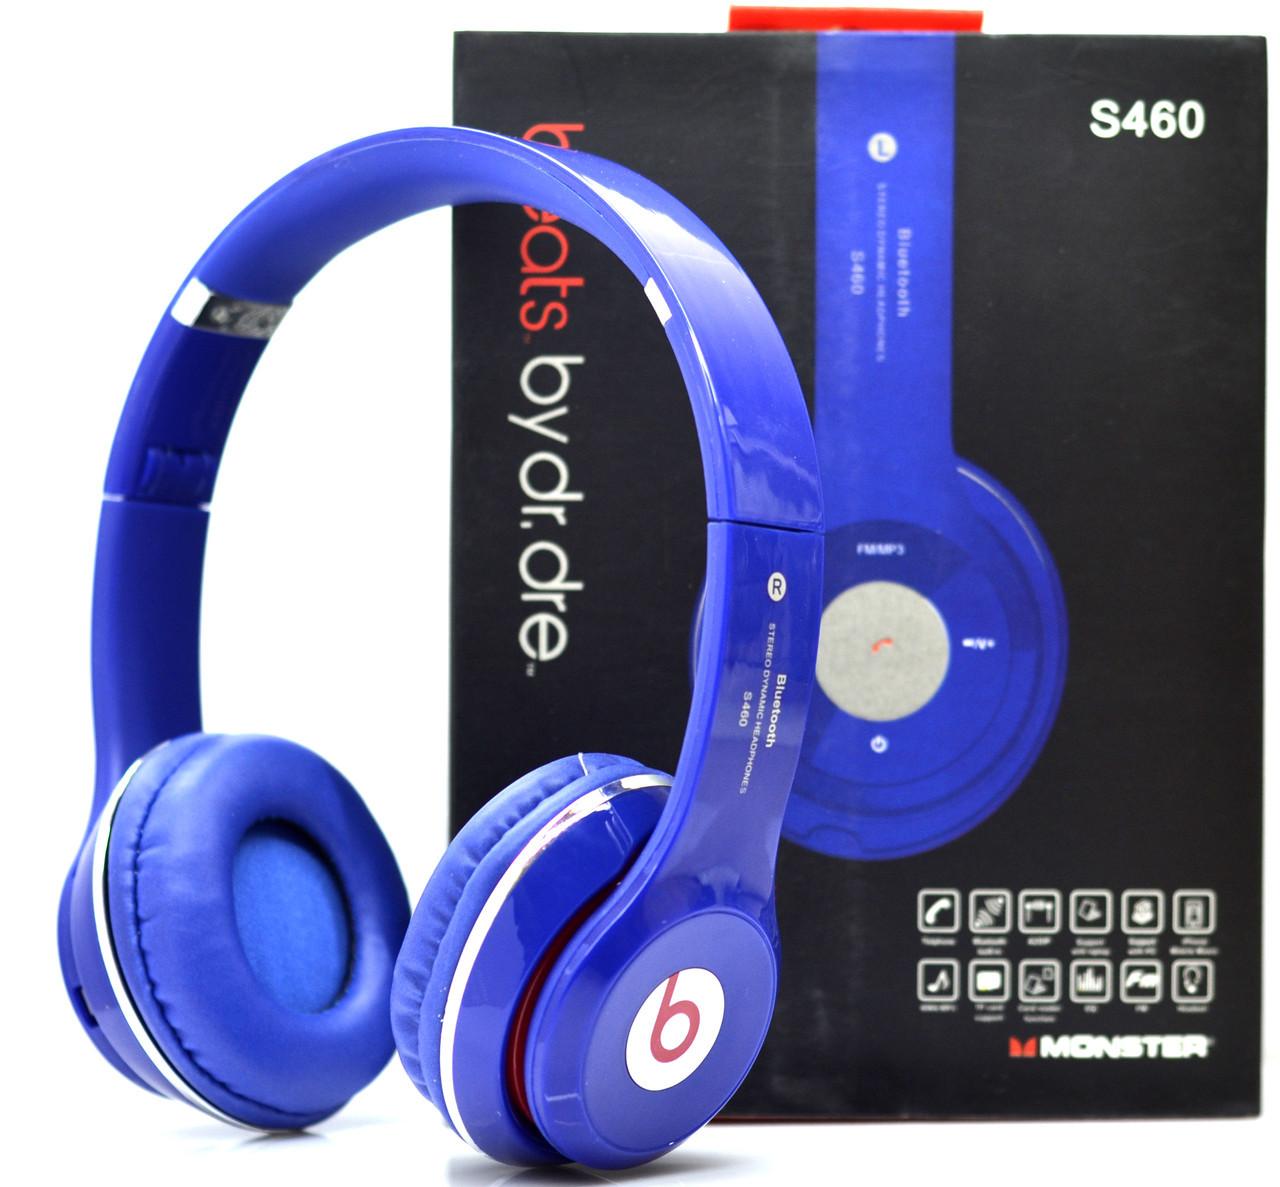 Беспроводные наушники Beats Solo HD S460 Bluetooth blue с MP3 плеером синие  реплика - Интернет- 678589f48b22a